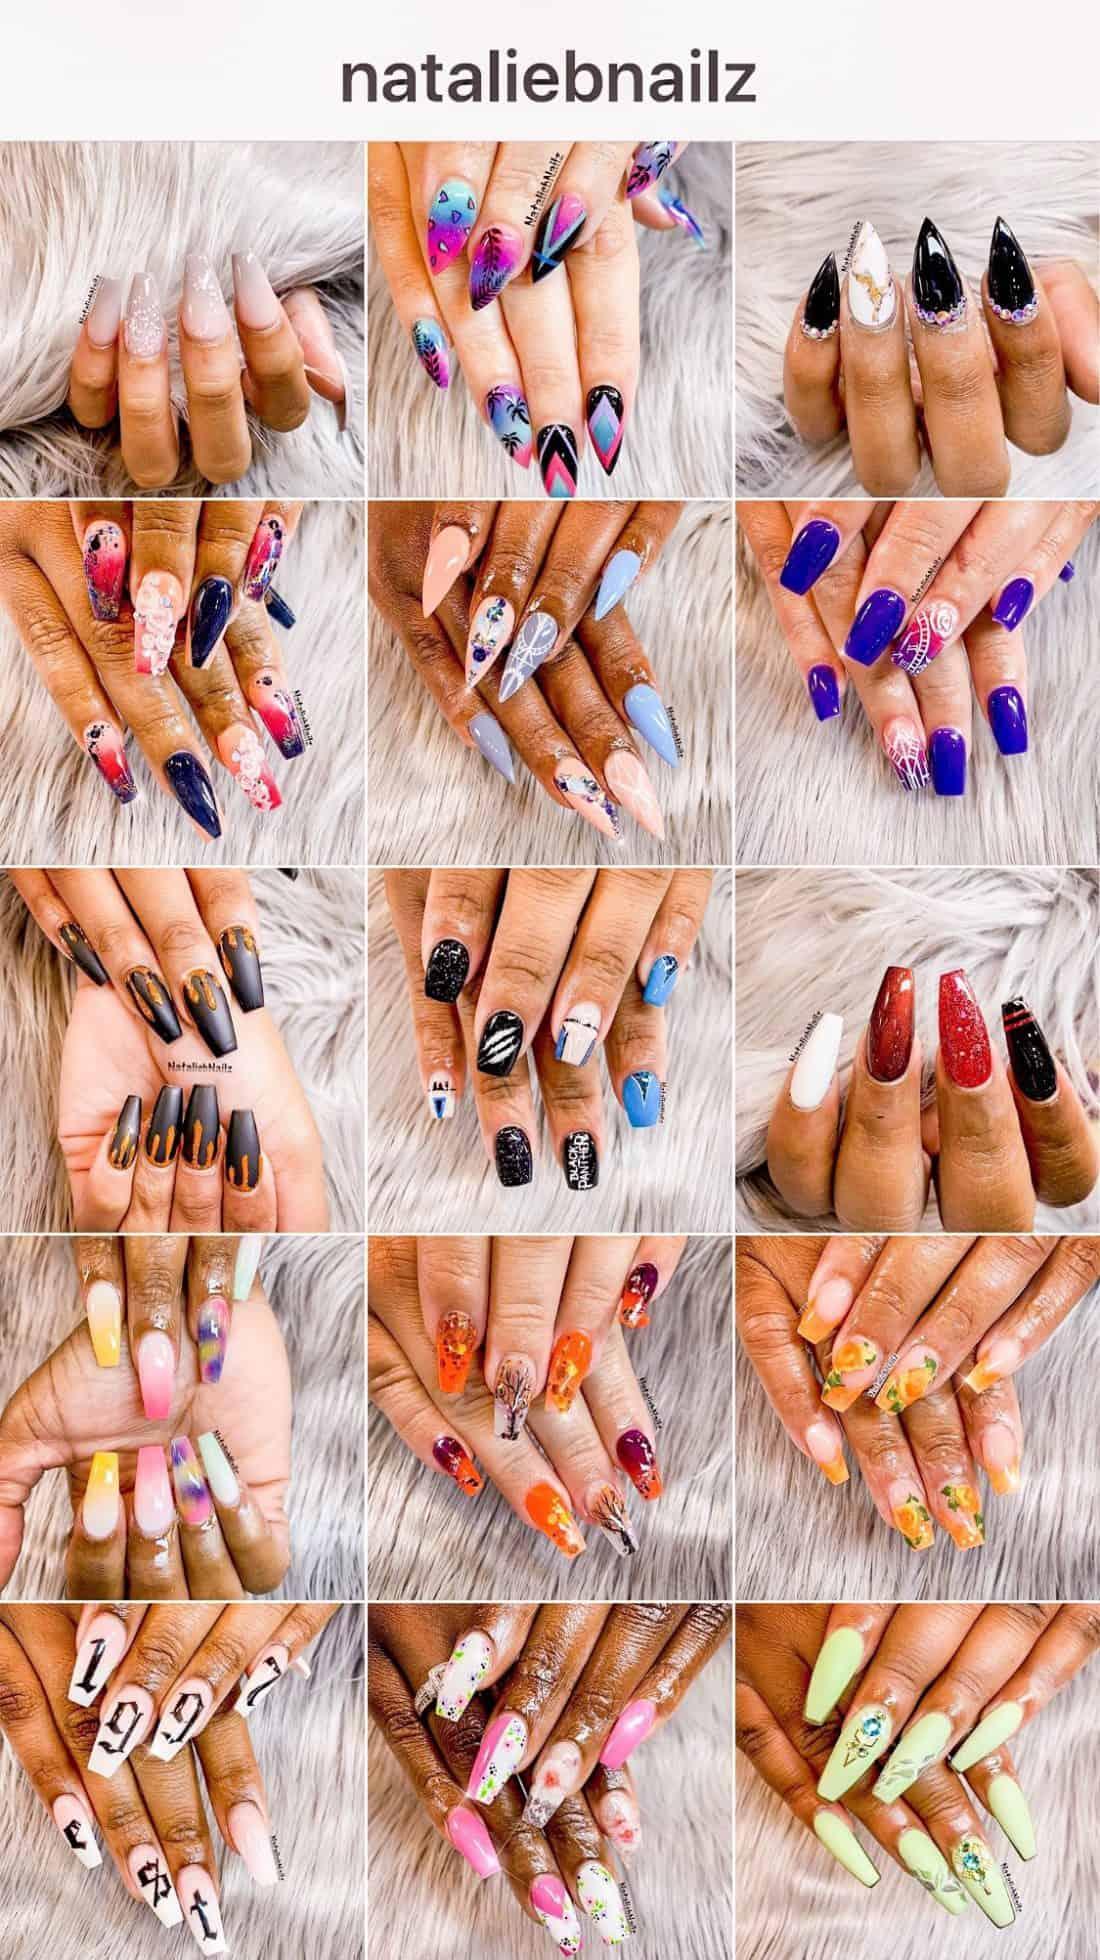 ShaundaNecole.com | Wonder Nails meet @NatalieBNailz